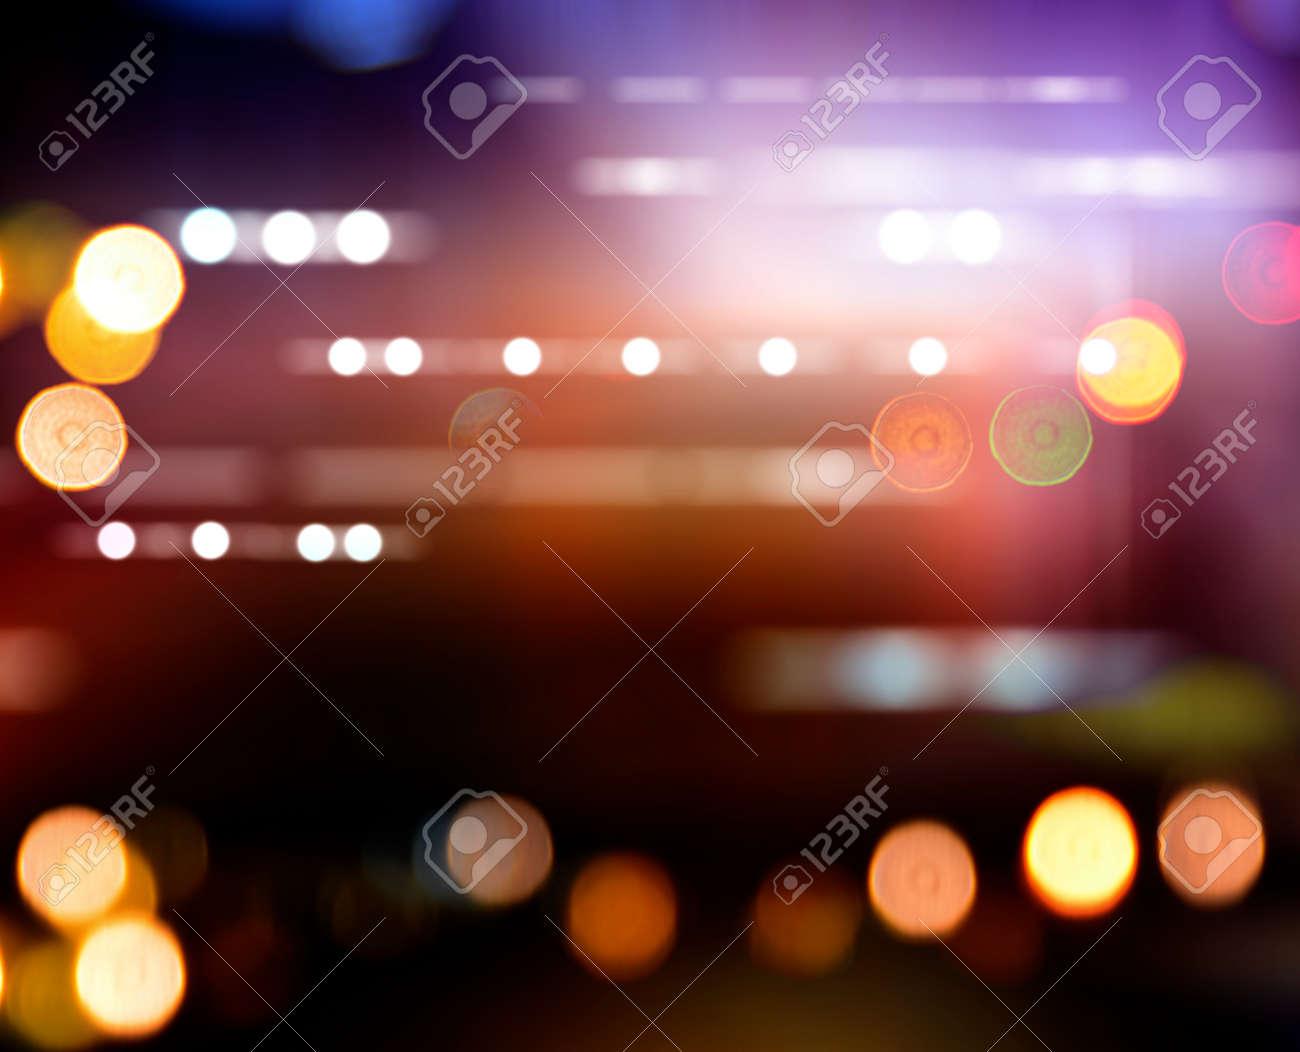 city lights blurred bokeh background - 32843873